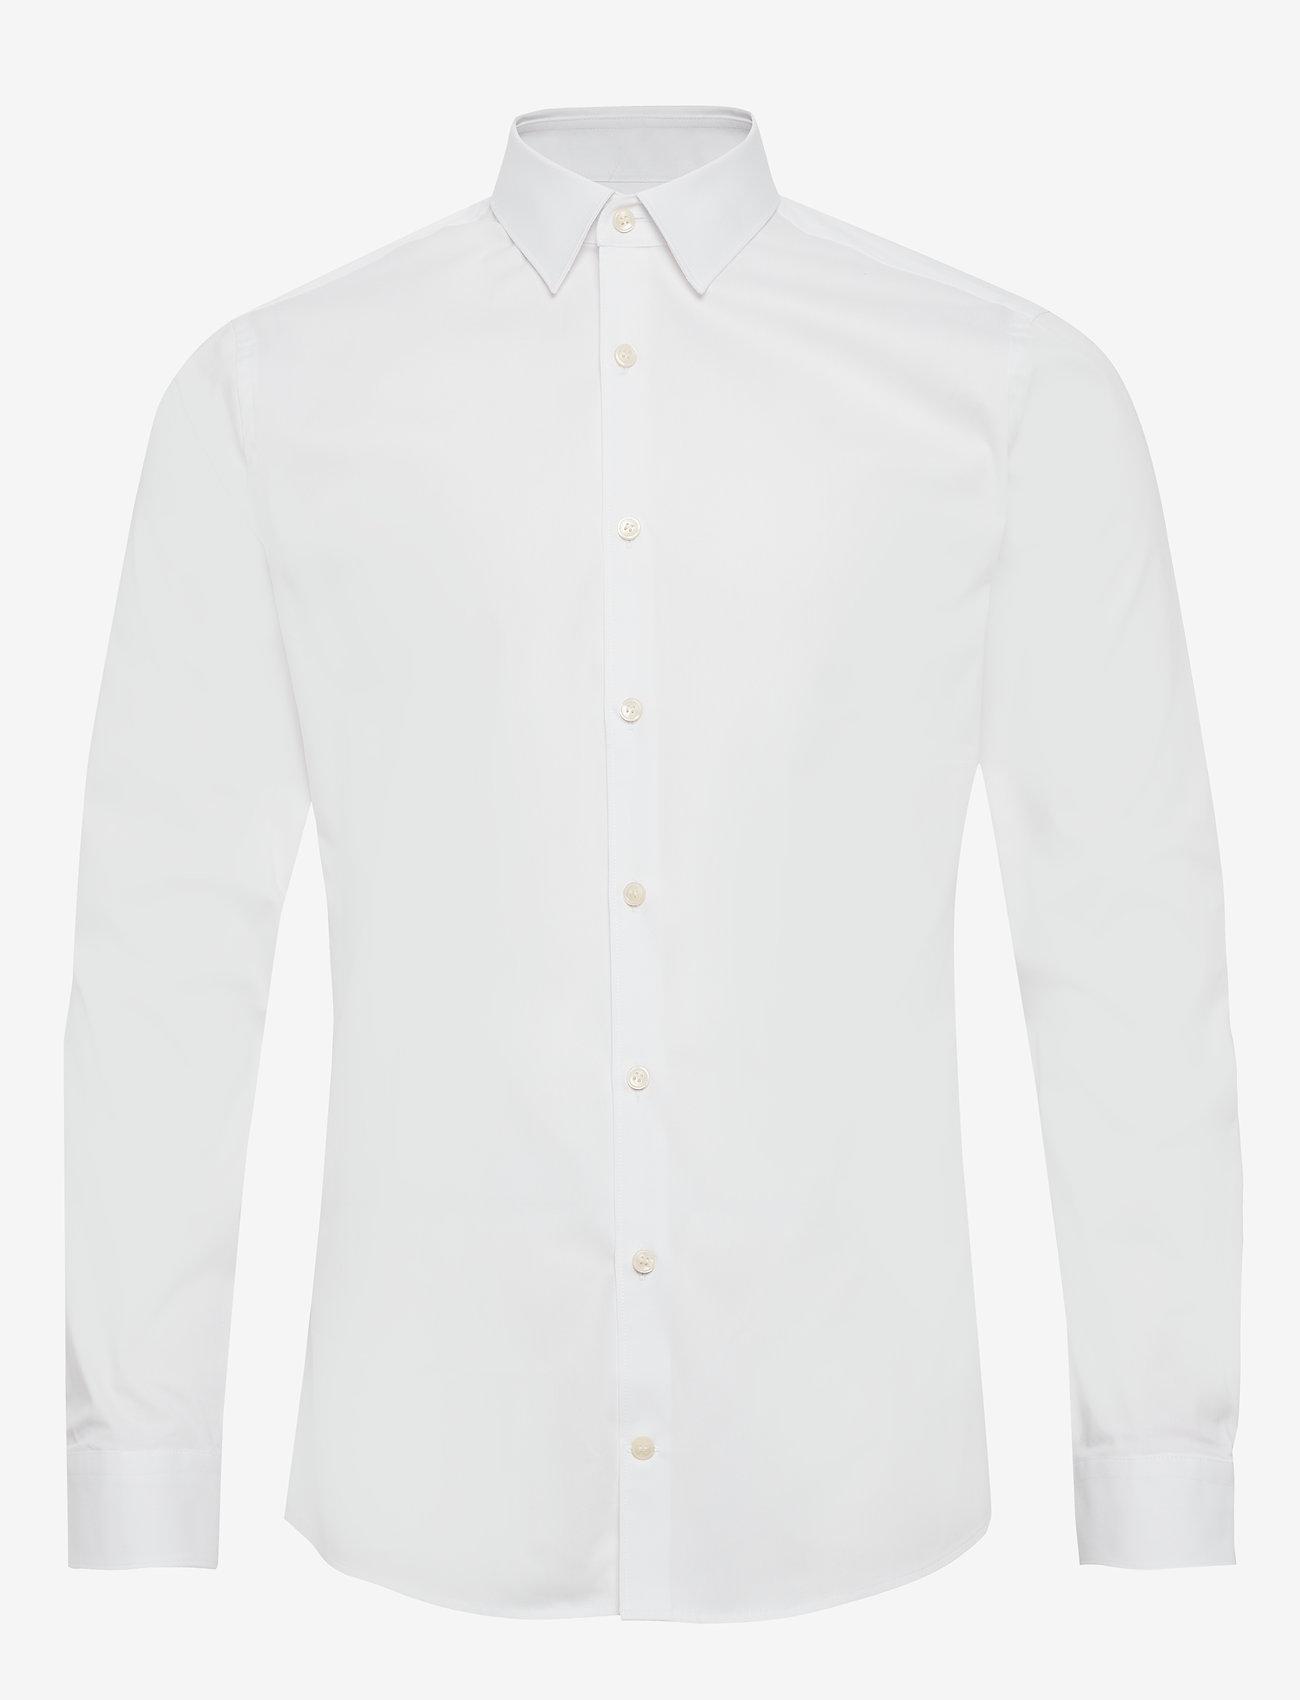 Tiger of Sweden - FILBRODIE - basic skjorter - pure white - 0